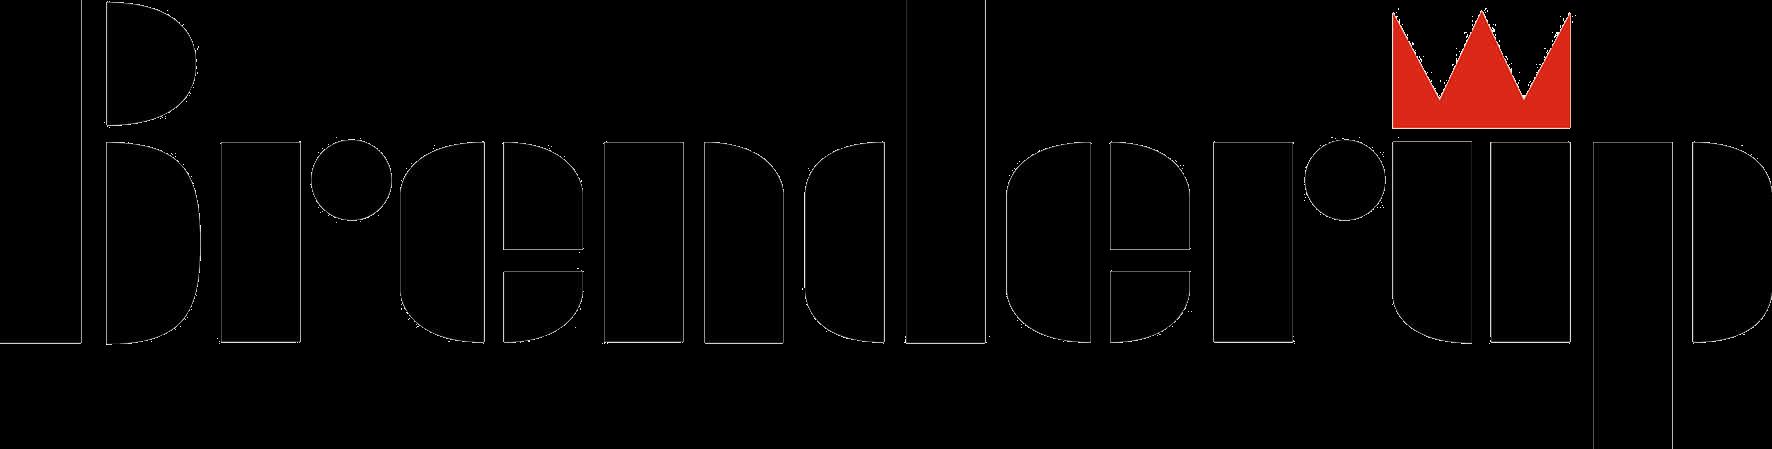 Brenderup_logo-huge.png